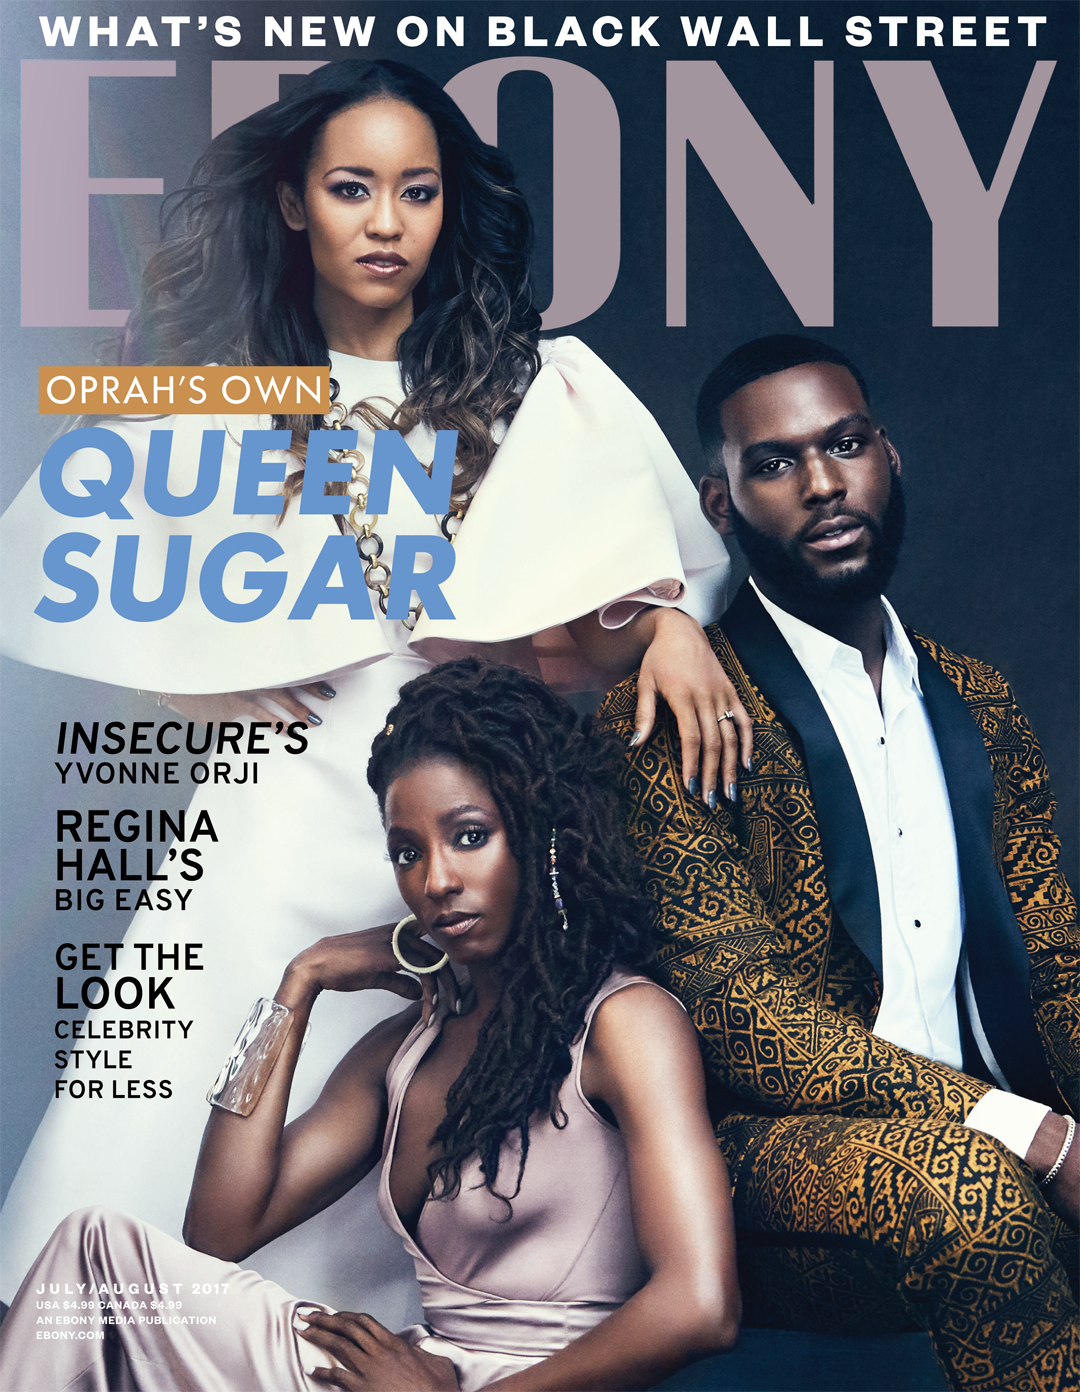 9e17b9aabf06 EBONY Magazine cover featuring Queen Sugar cast